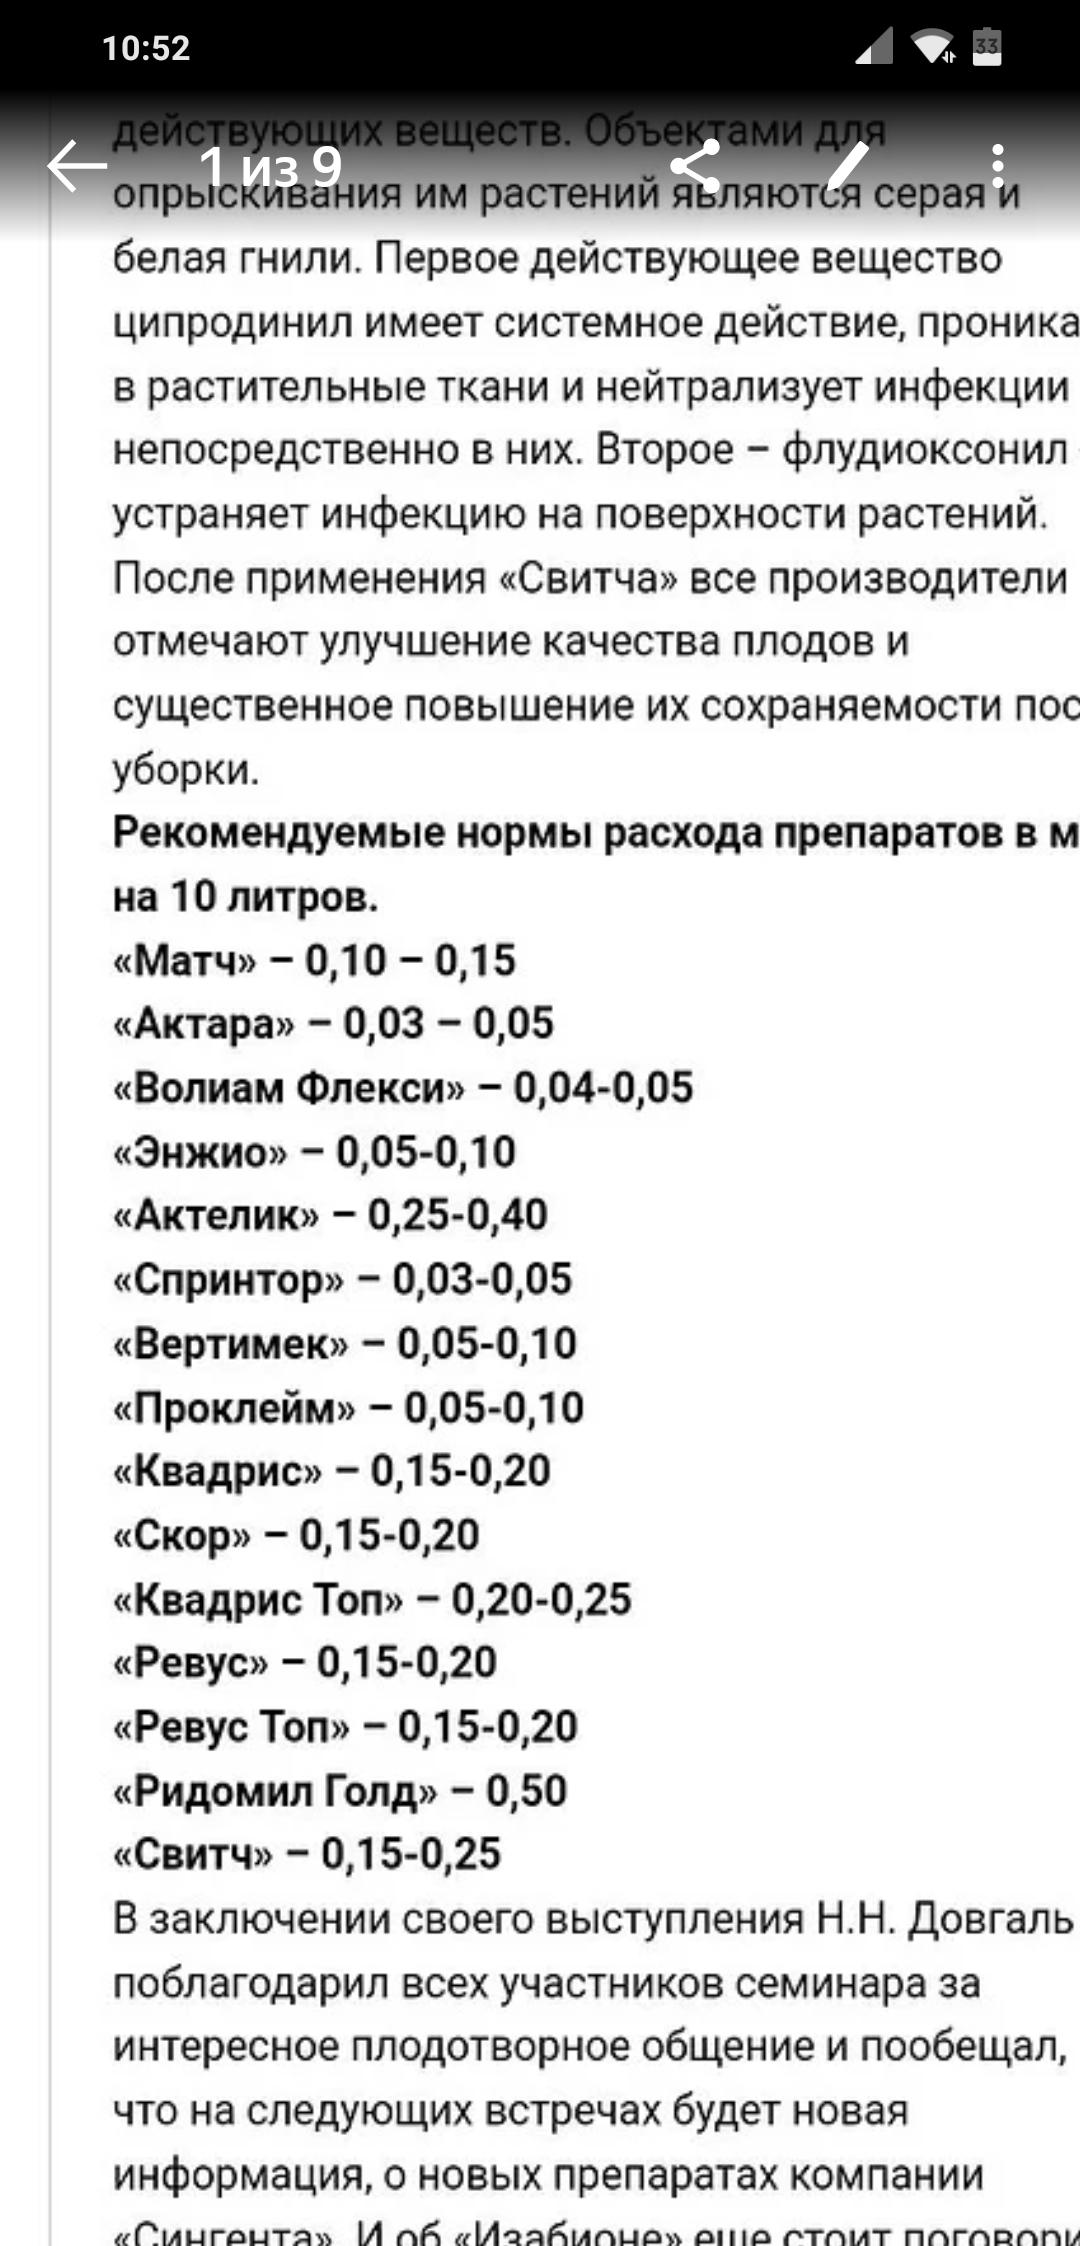 screenshot2019-09-04-10-52-44-950ruyandexdisk.jpg